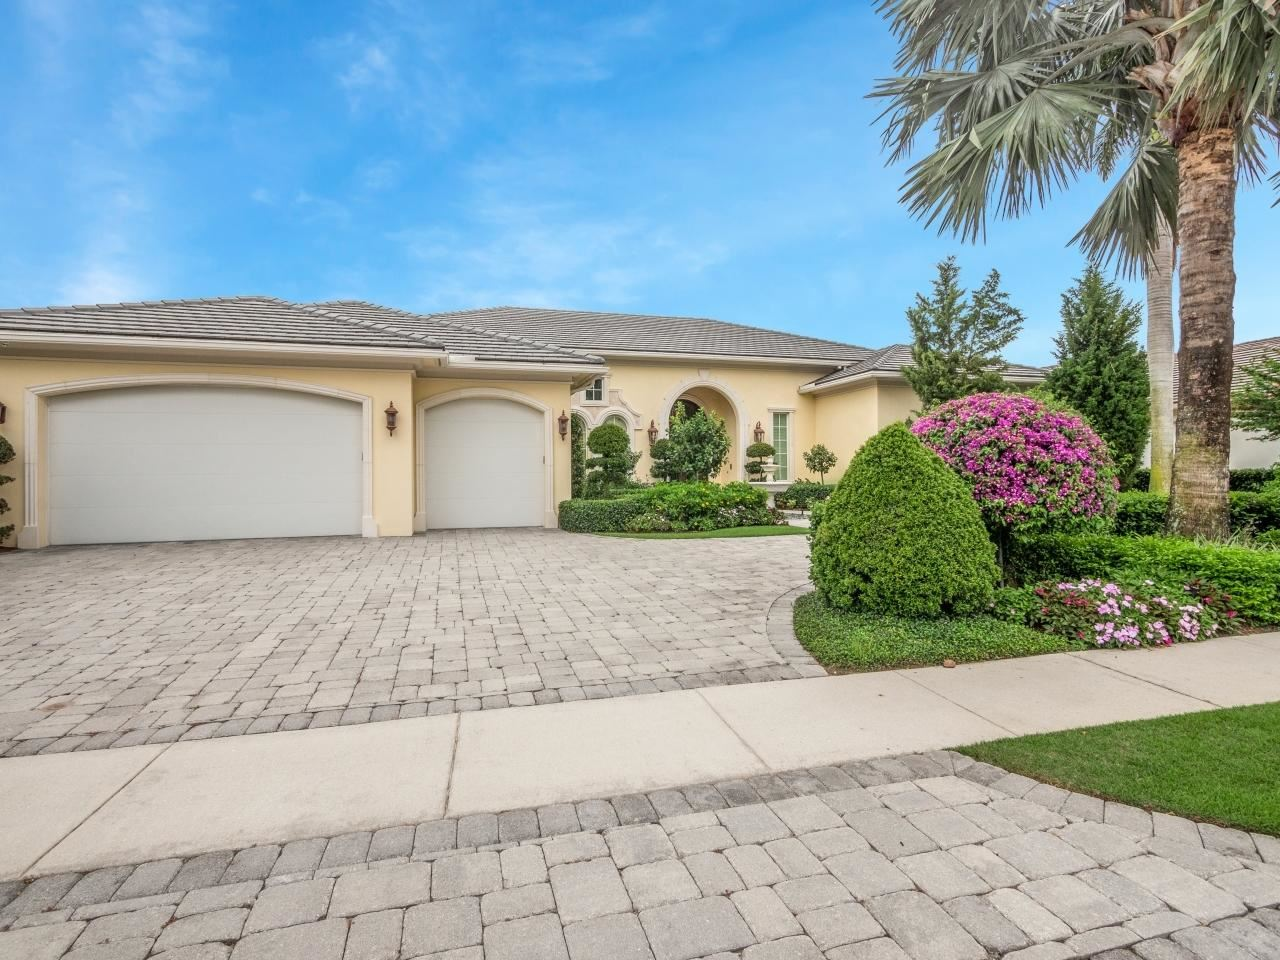 Photo of 661 Hermitage Circle, Palm Beach Gardens, FL 33410 (MLS # RX-10716404)